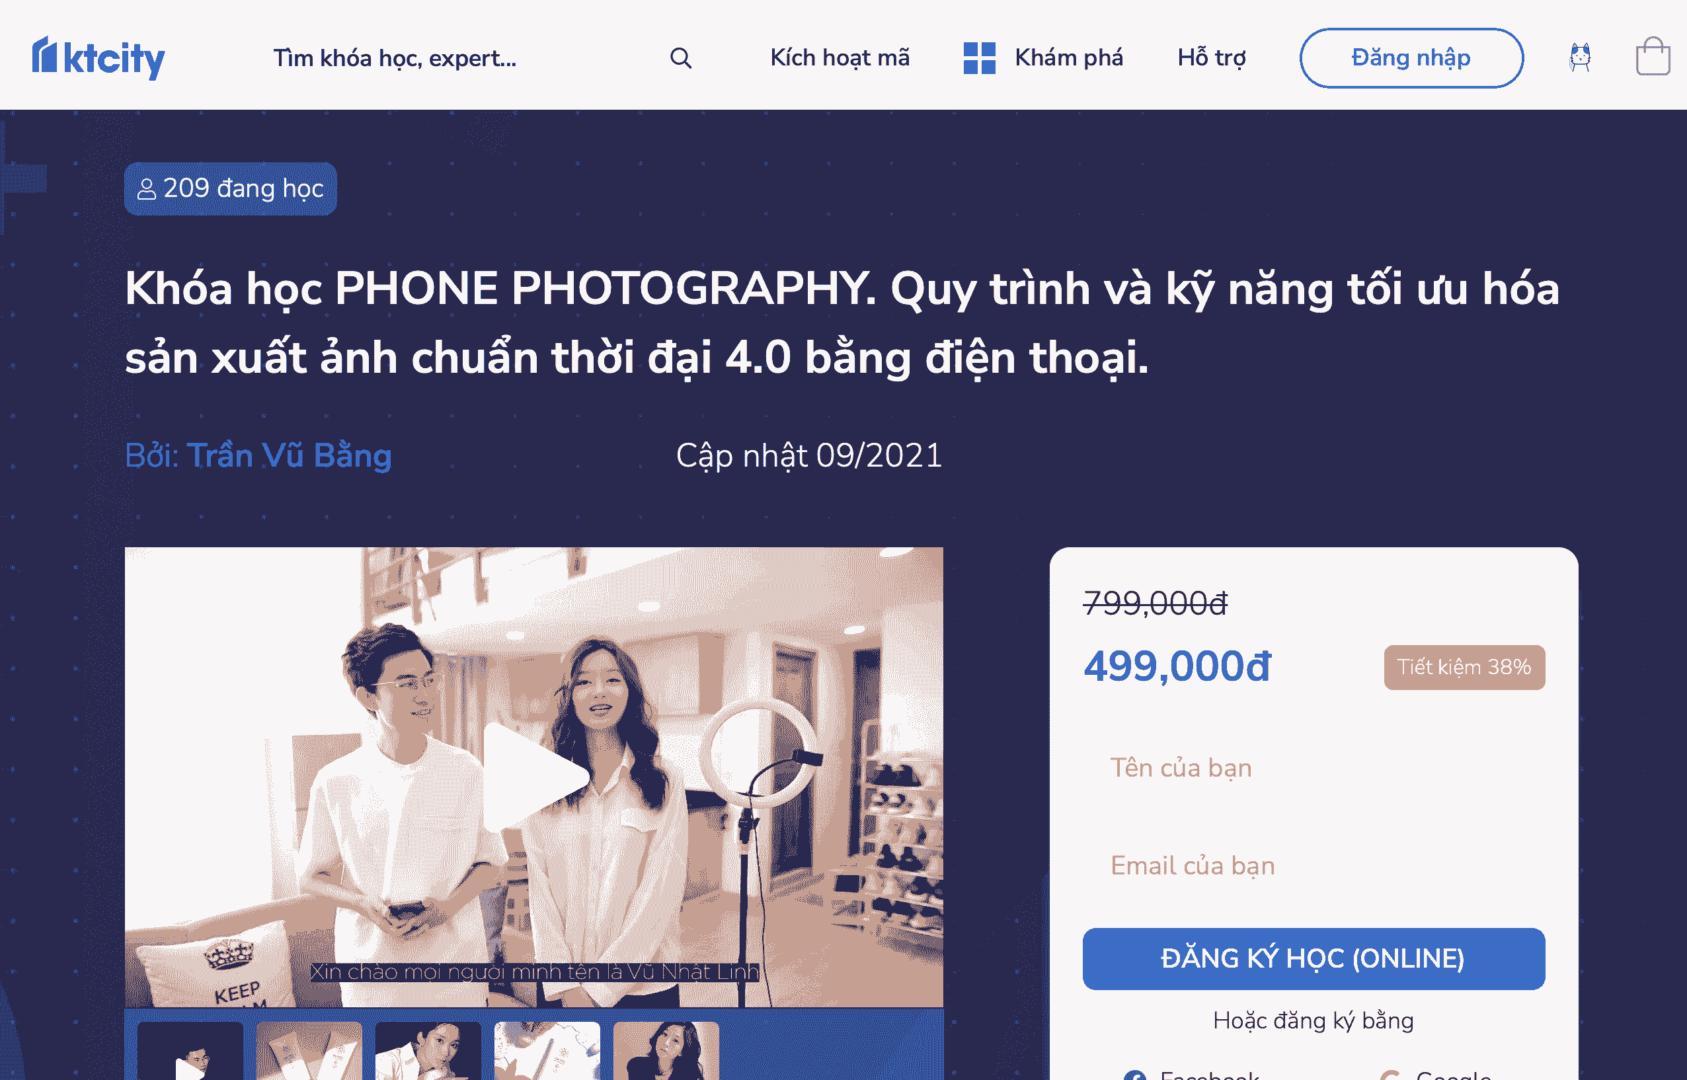 khoa-hoc-kinh-doanh-thuong-mai-dien-tu-cua-phone-photography